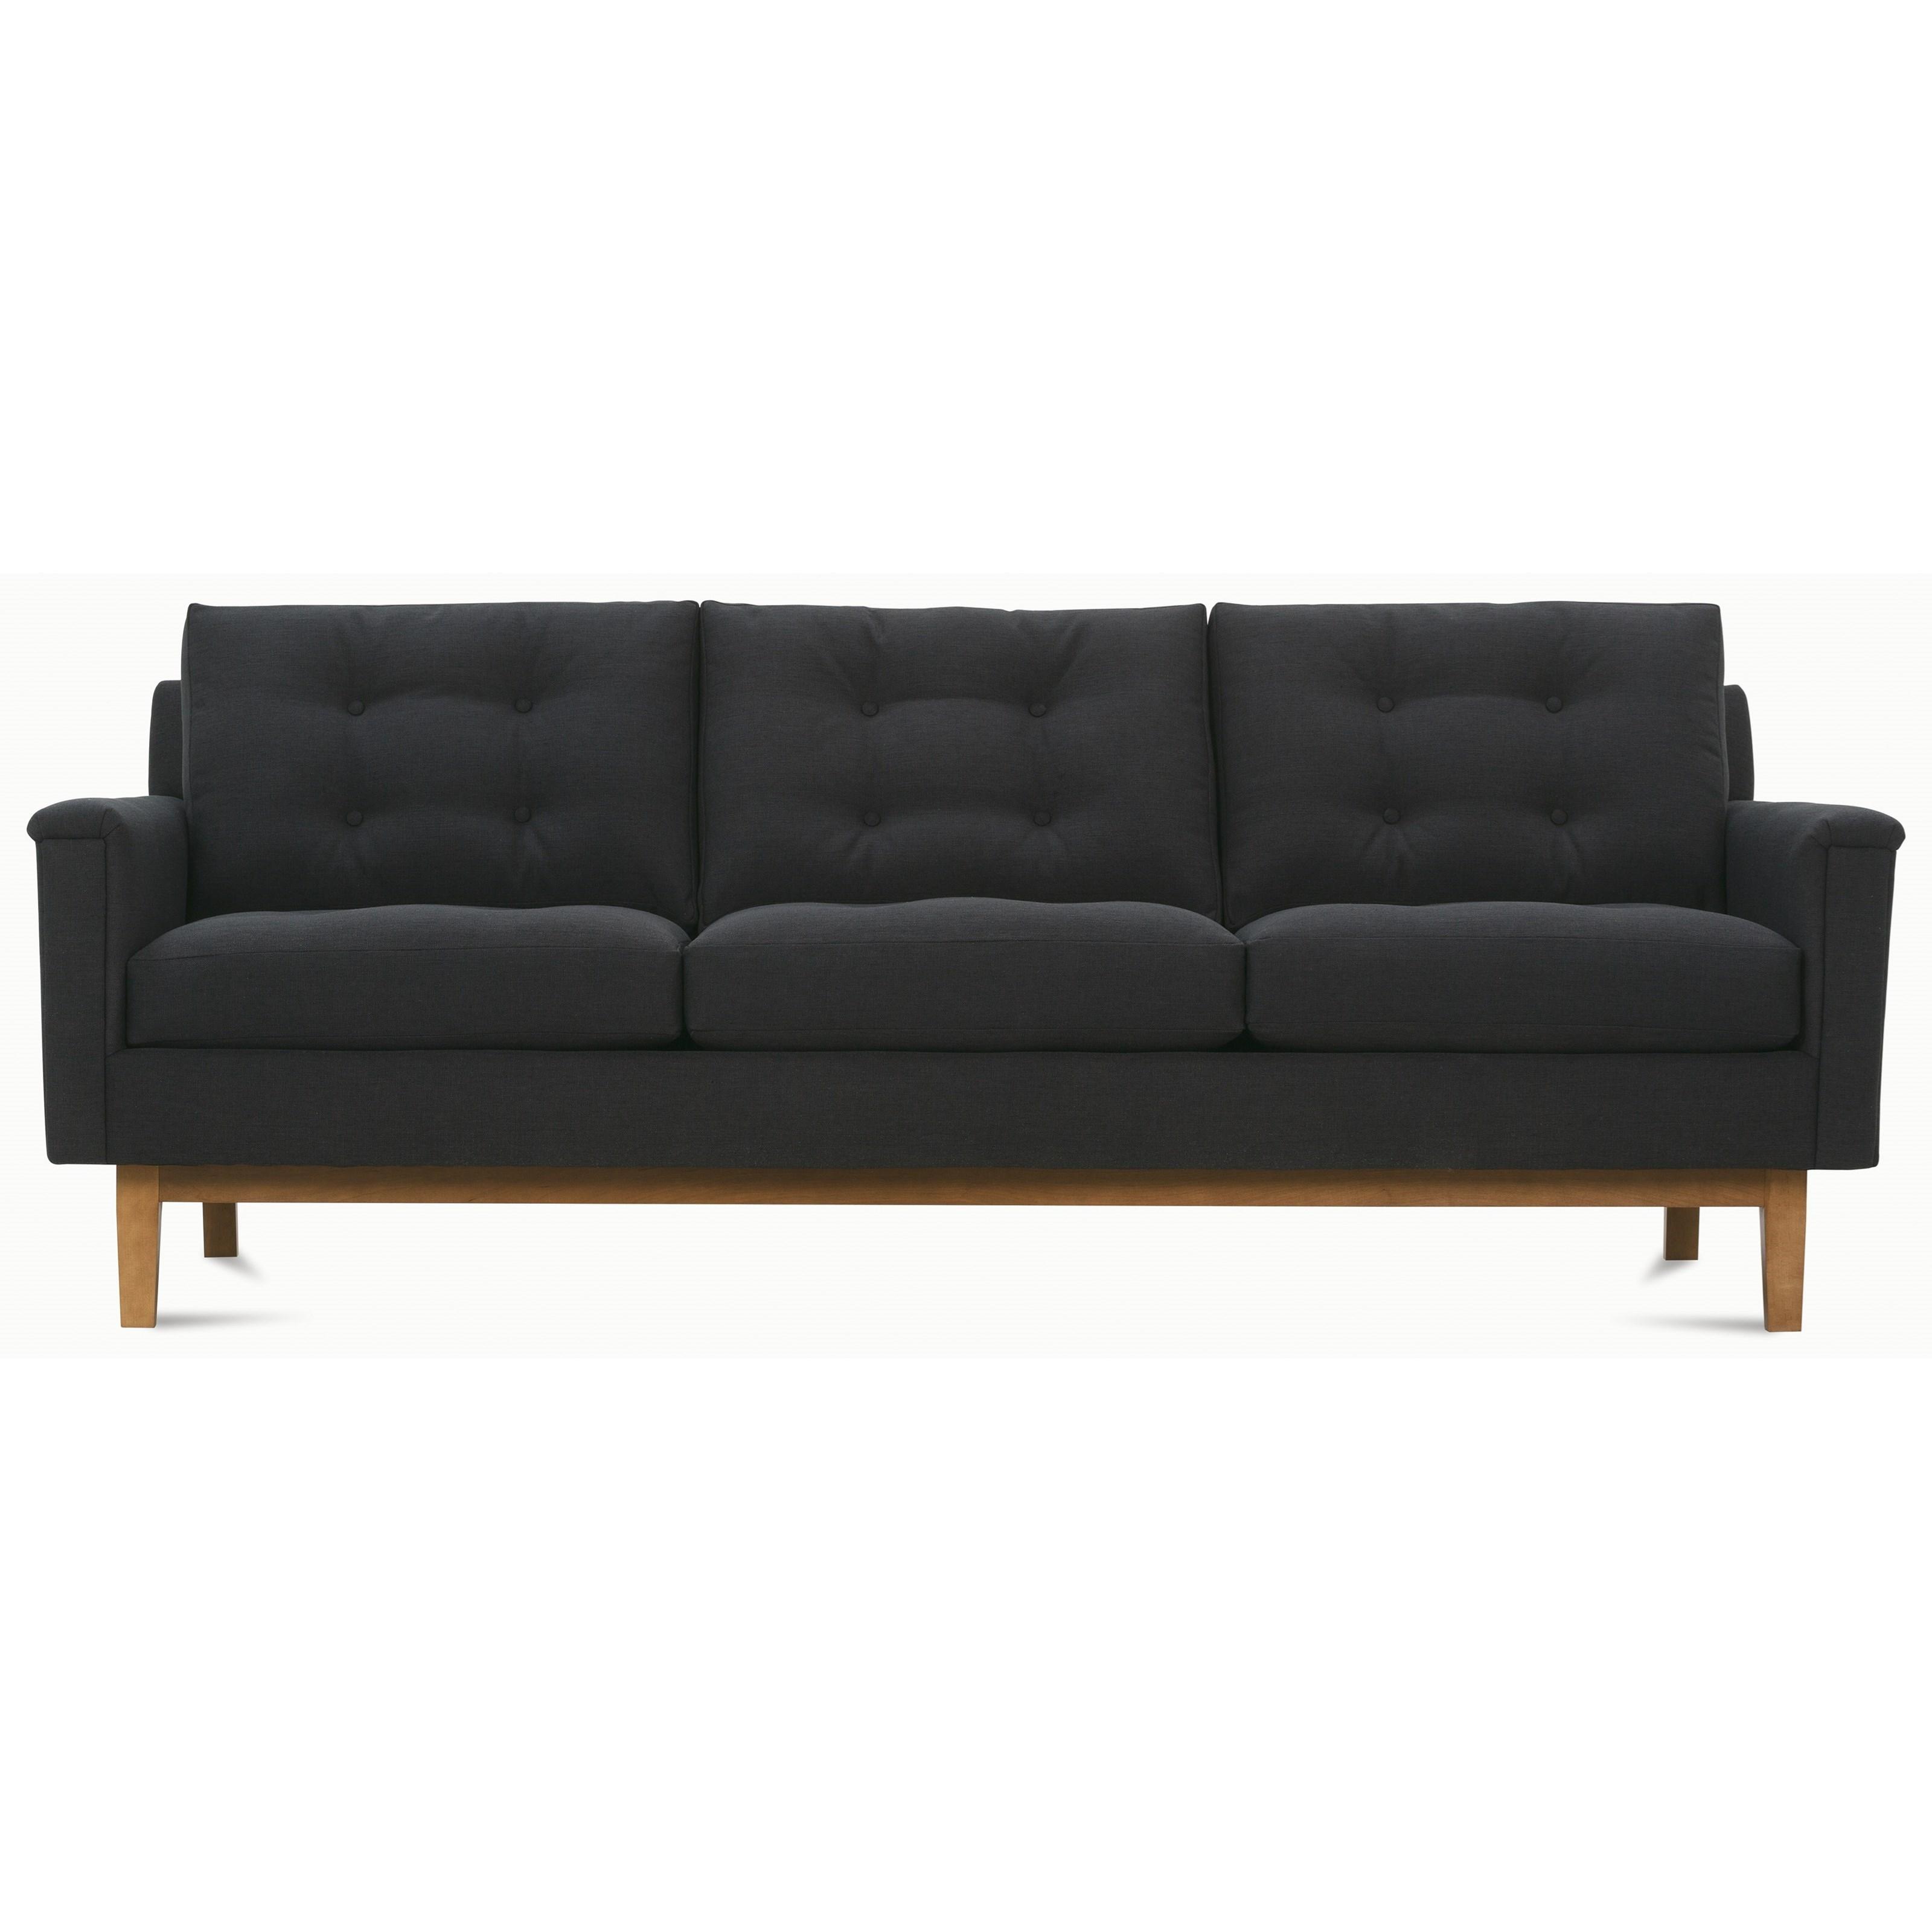 Mid Century Modern Sofa Pillows : Rowe Ethan P160-002 Mid-Century Modern Sofa with Tufted Back Pillows Becker Furniture World ...